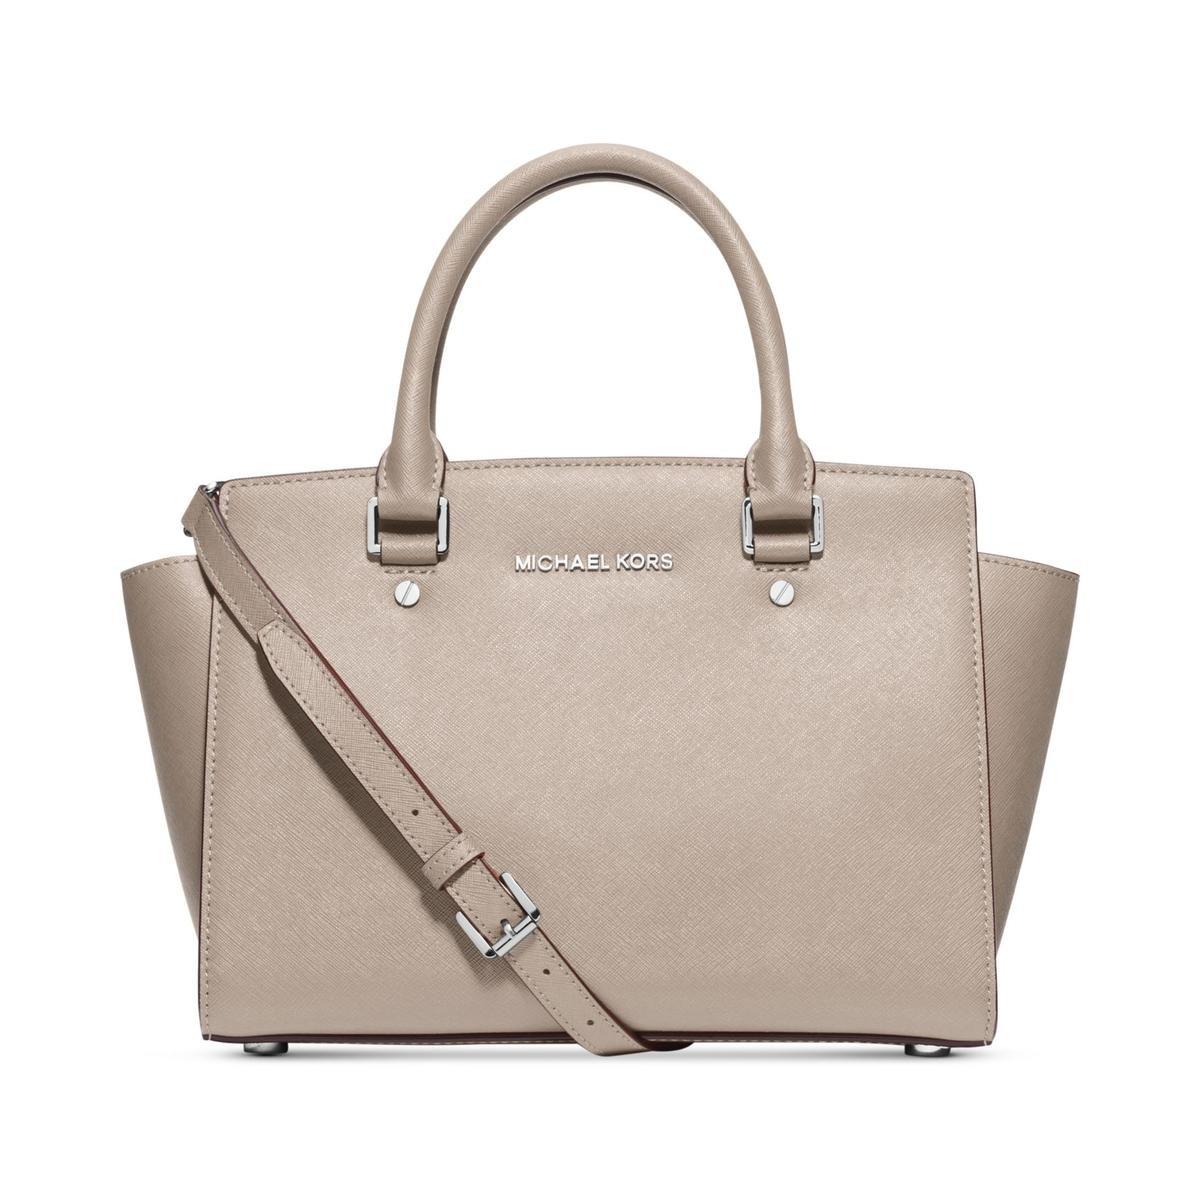 8a3b539ad258 MICHAEL Michael Kors Selma Medium Satchel Dark Dune Gold  Amazon.co.uk   Shoes   Bags